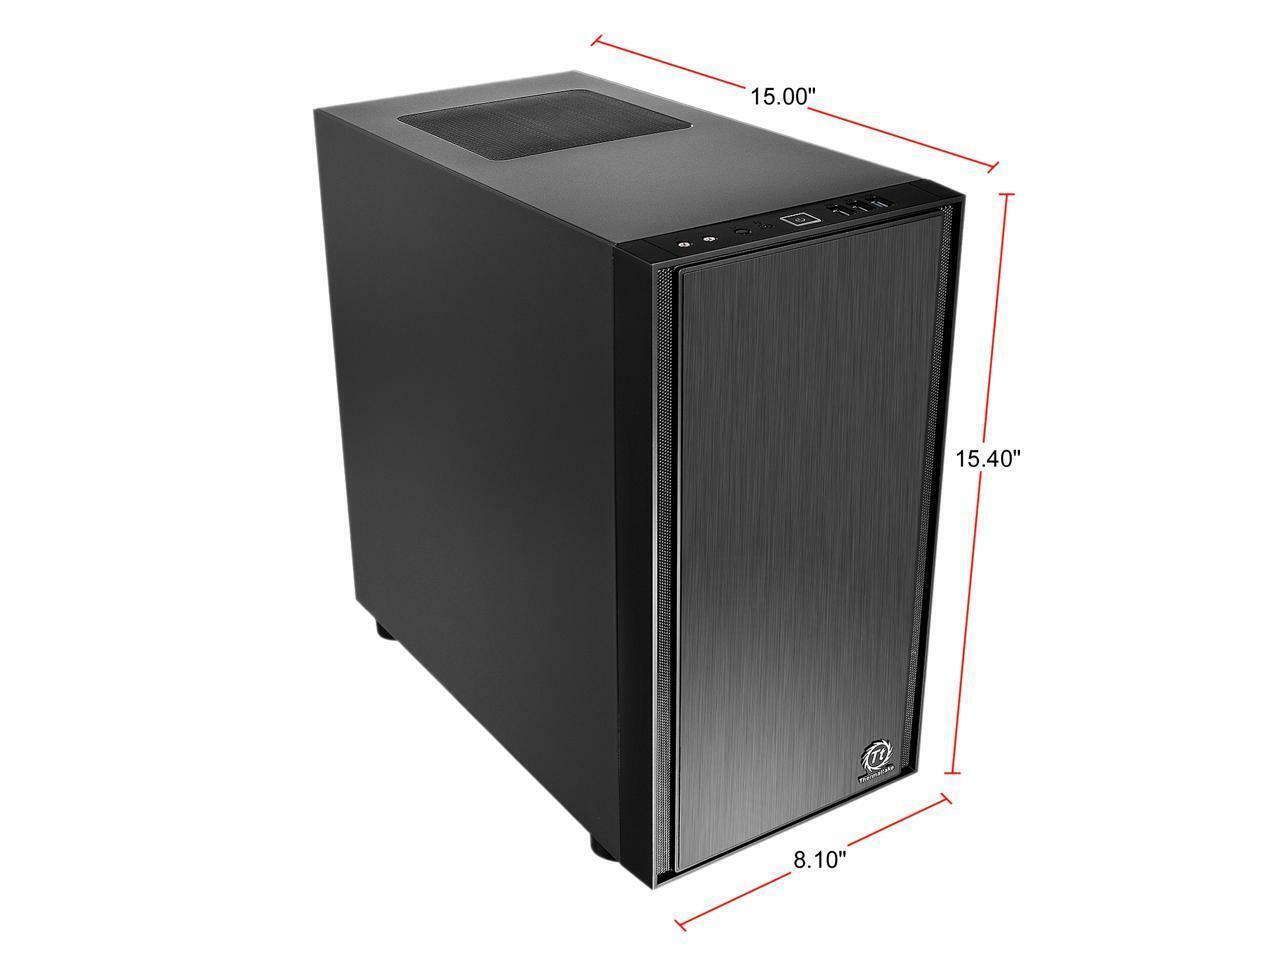 ca-1j1-00s1nn-00 Thermaltake Versa H17 Micro Case ca1j100s1nn00